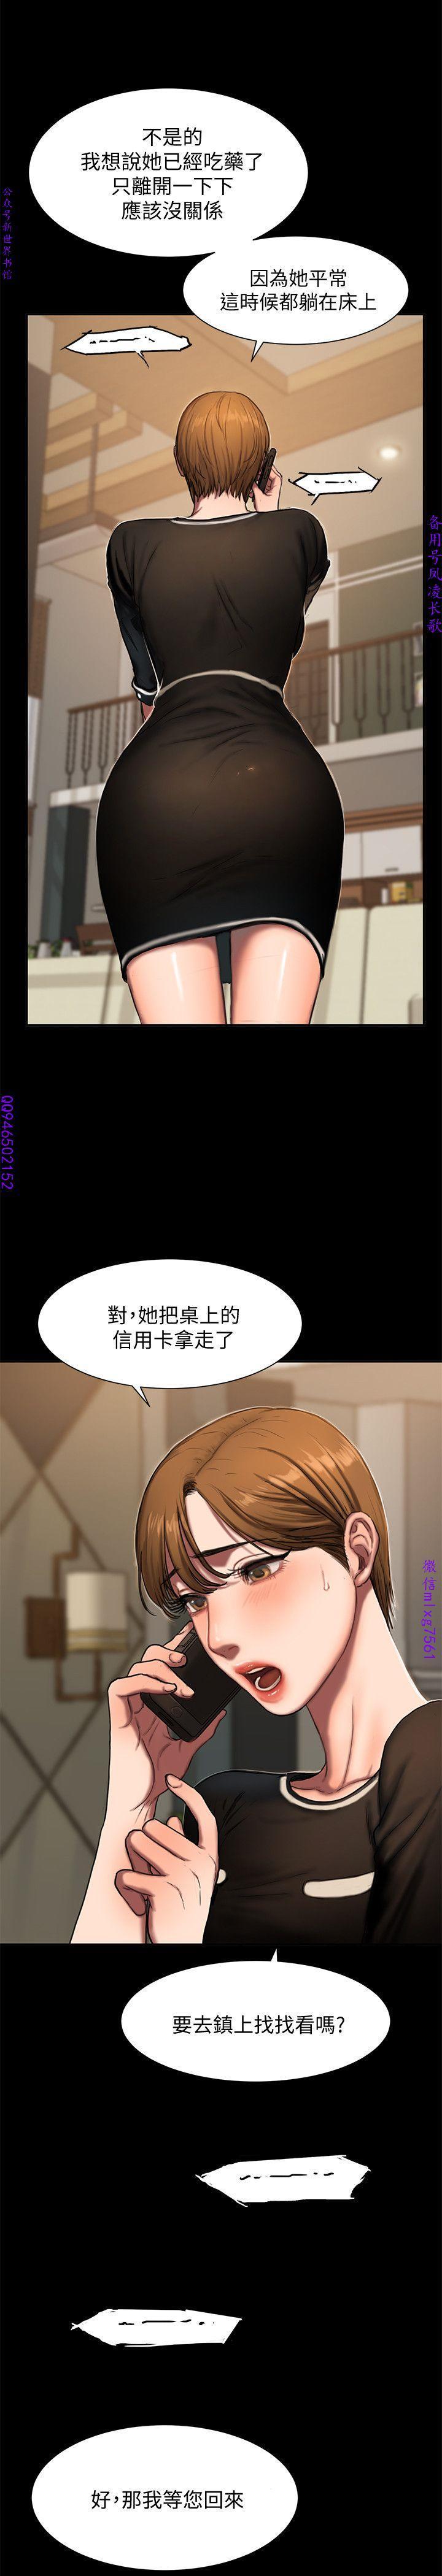 Run away 1-10【中文】 11